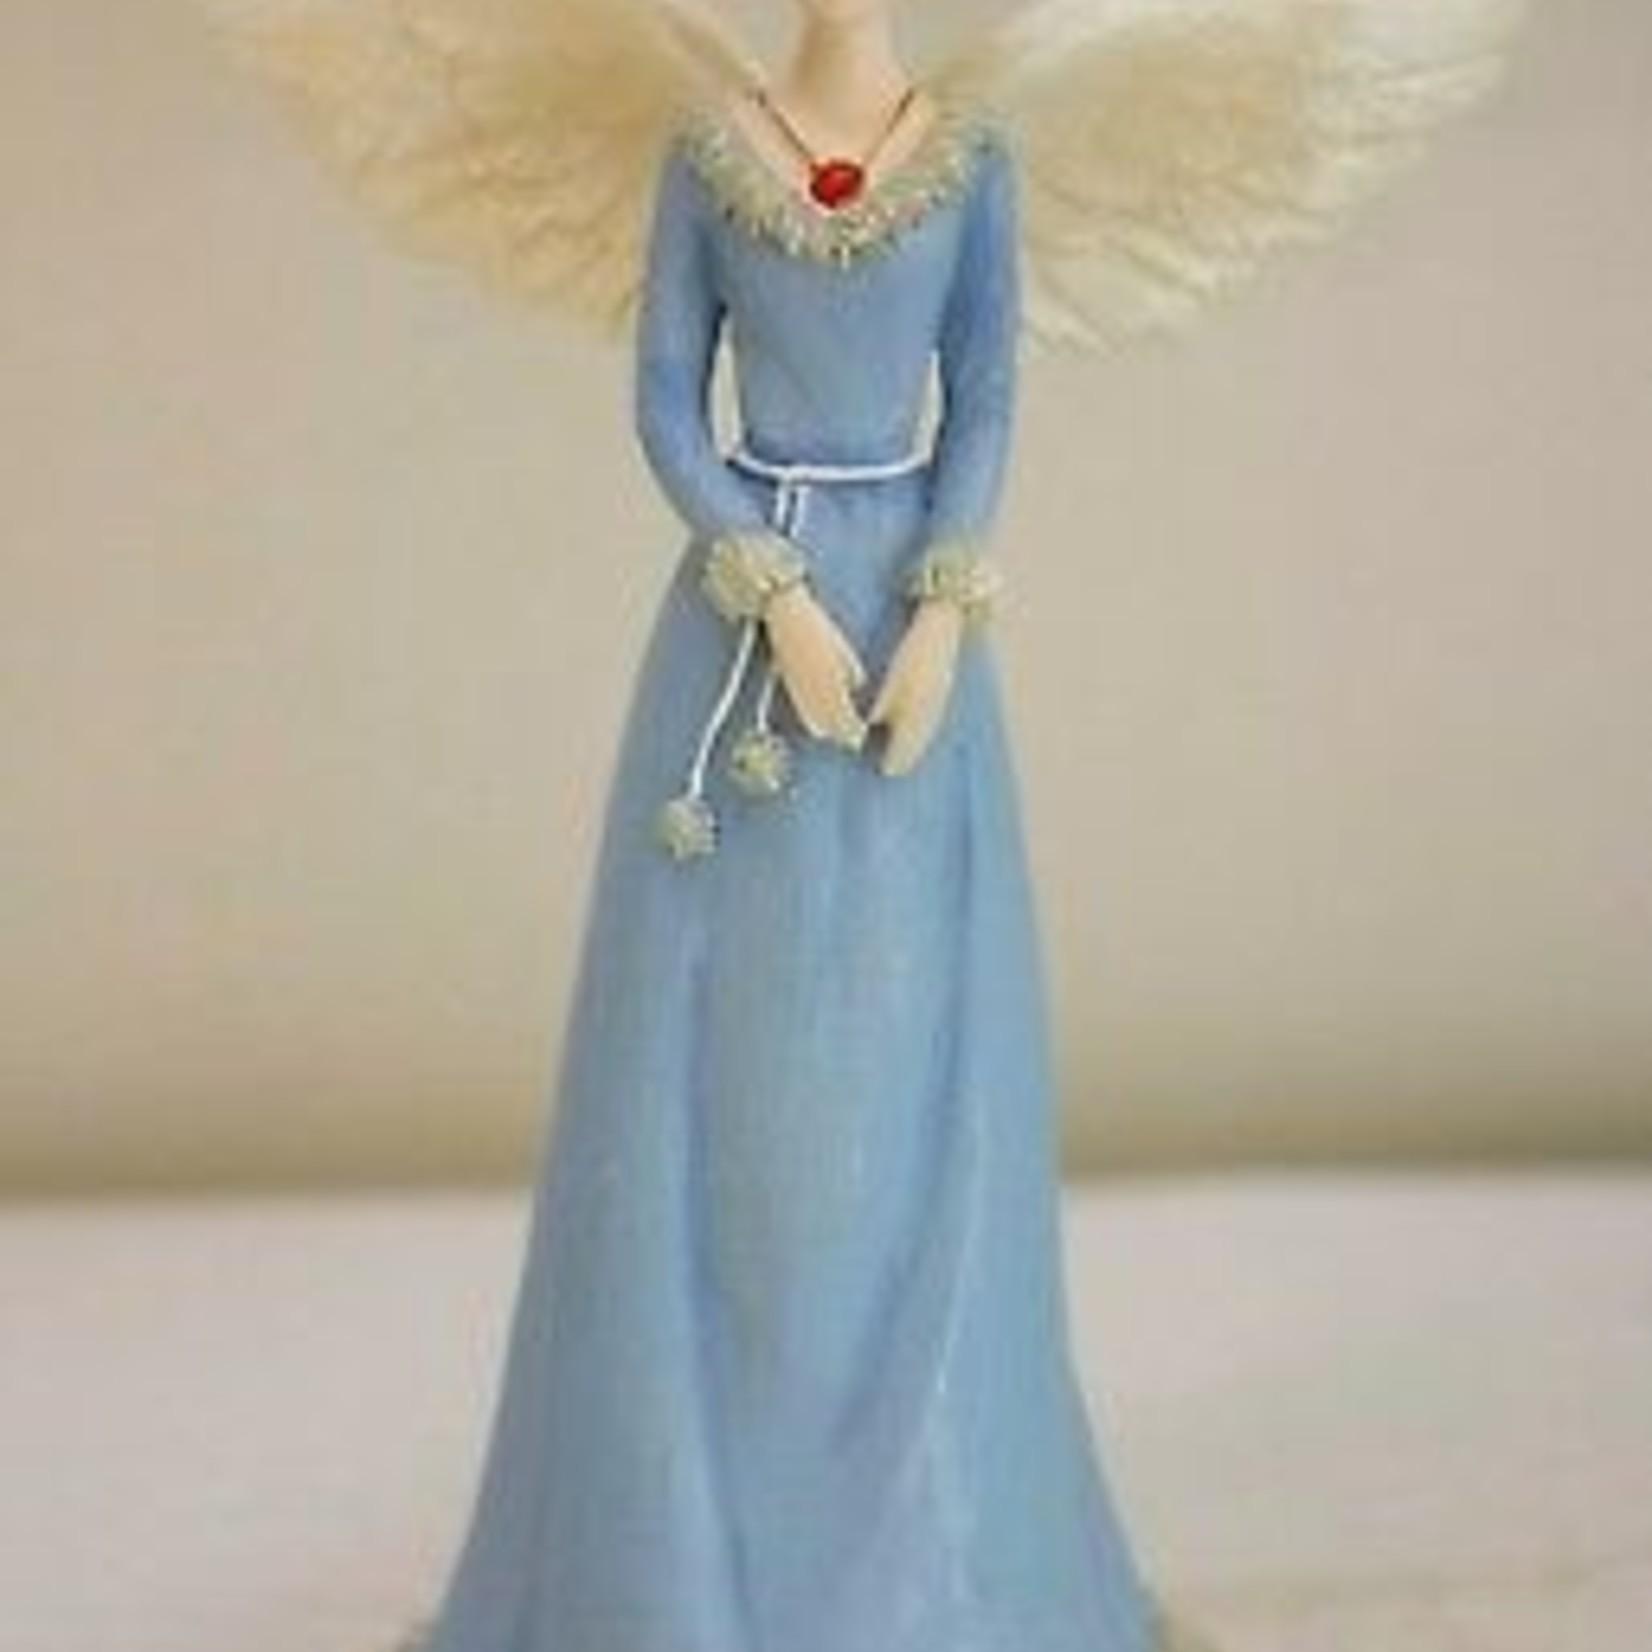 Angel Figurine January Birthstone